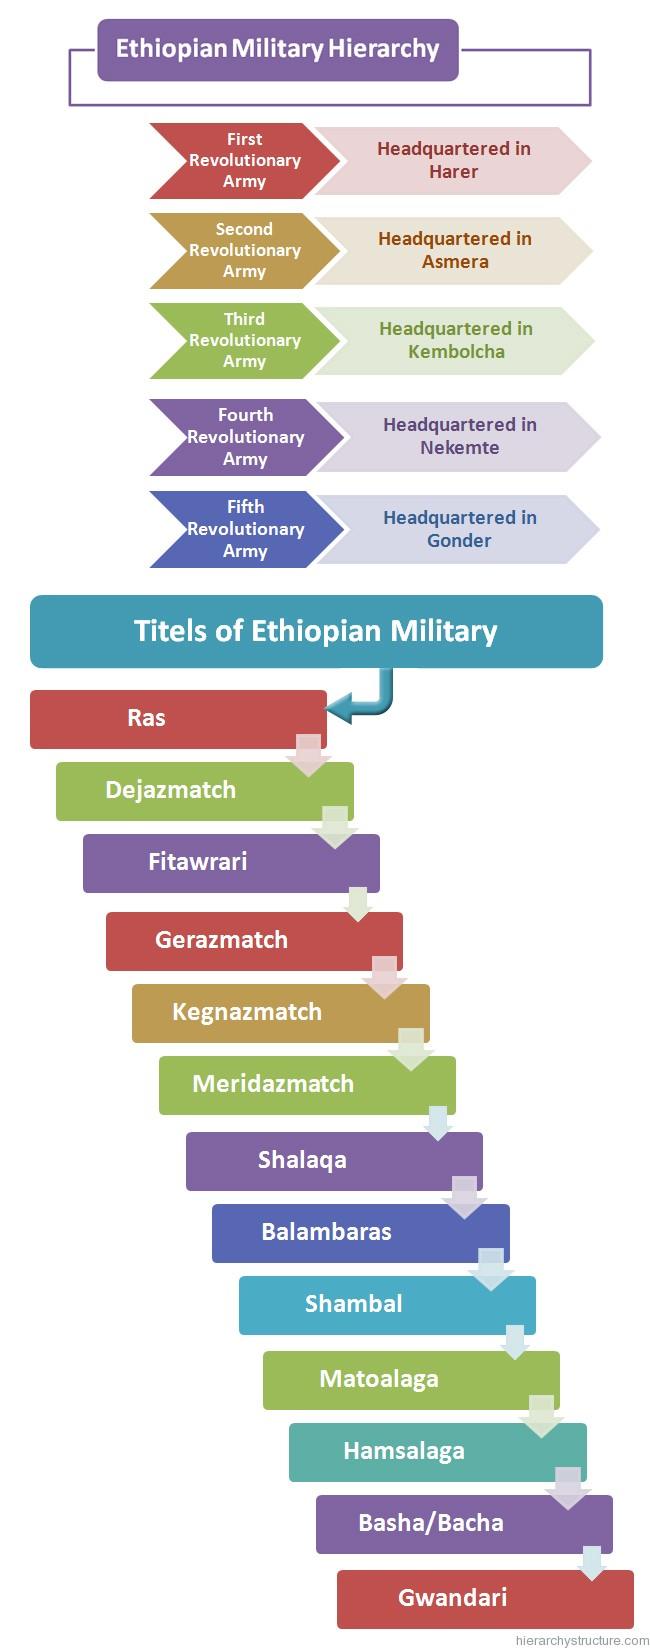 Ethiopian Military Hierarchy